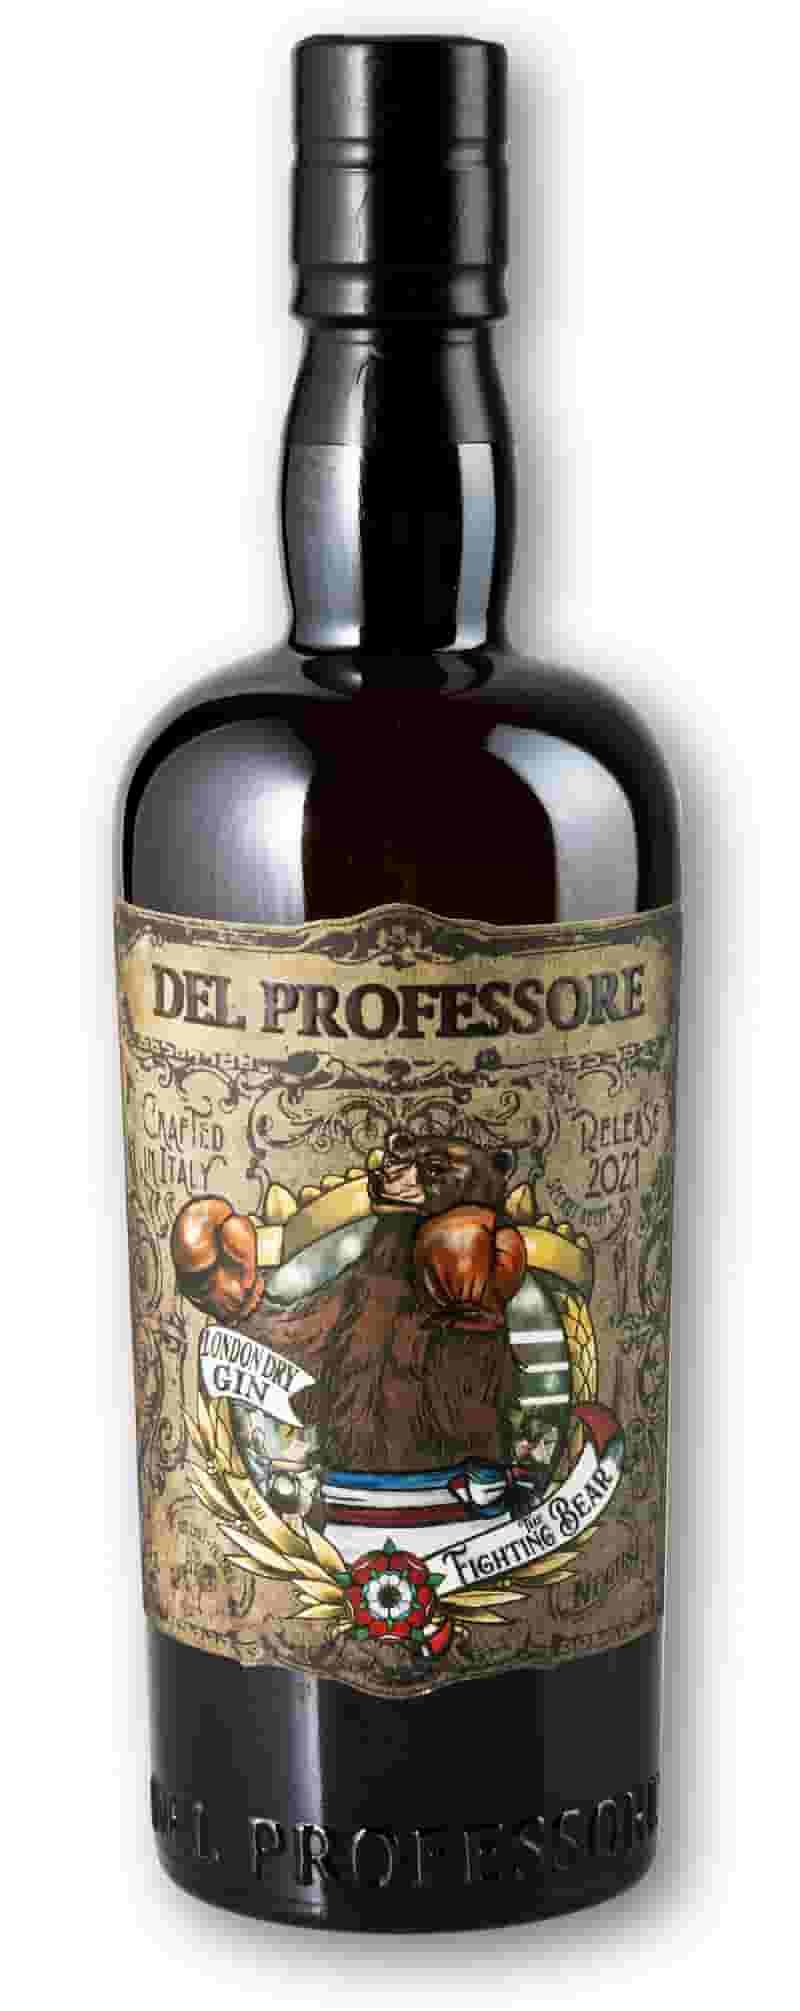 Del Professore The Fighting Bear London Dry Gin 2 (1)